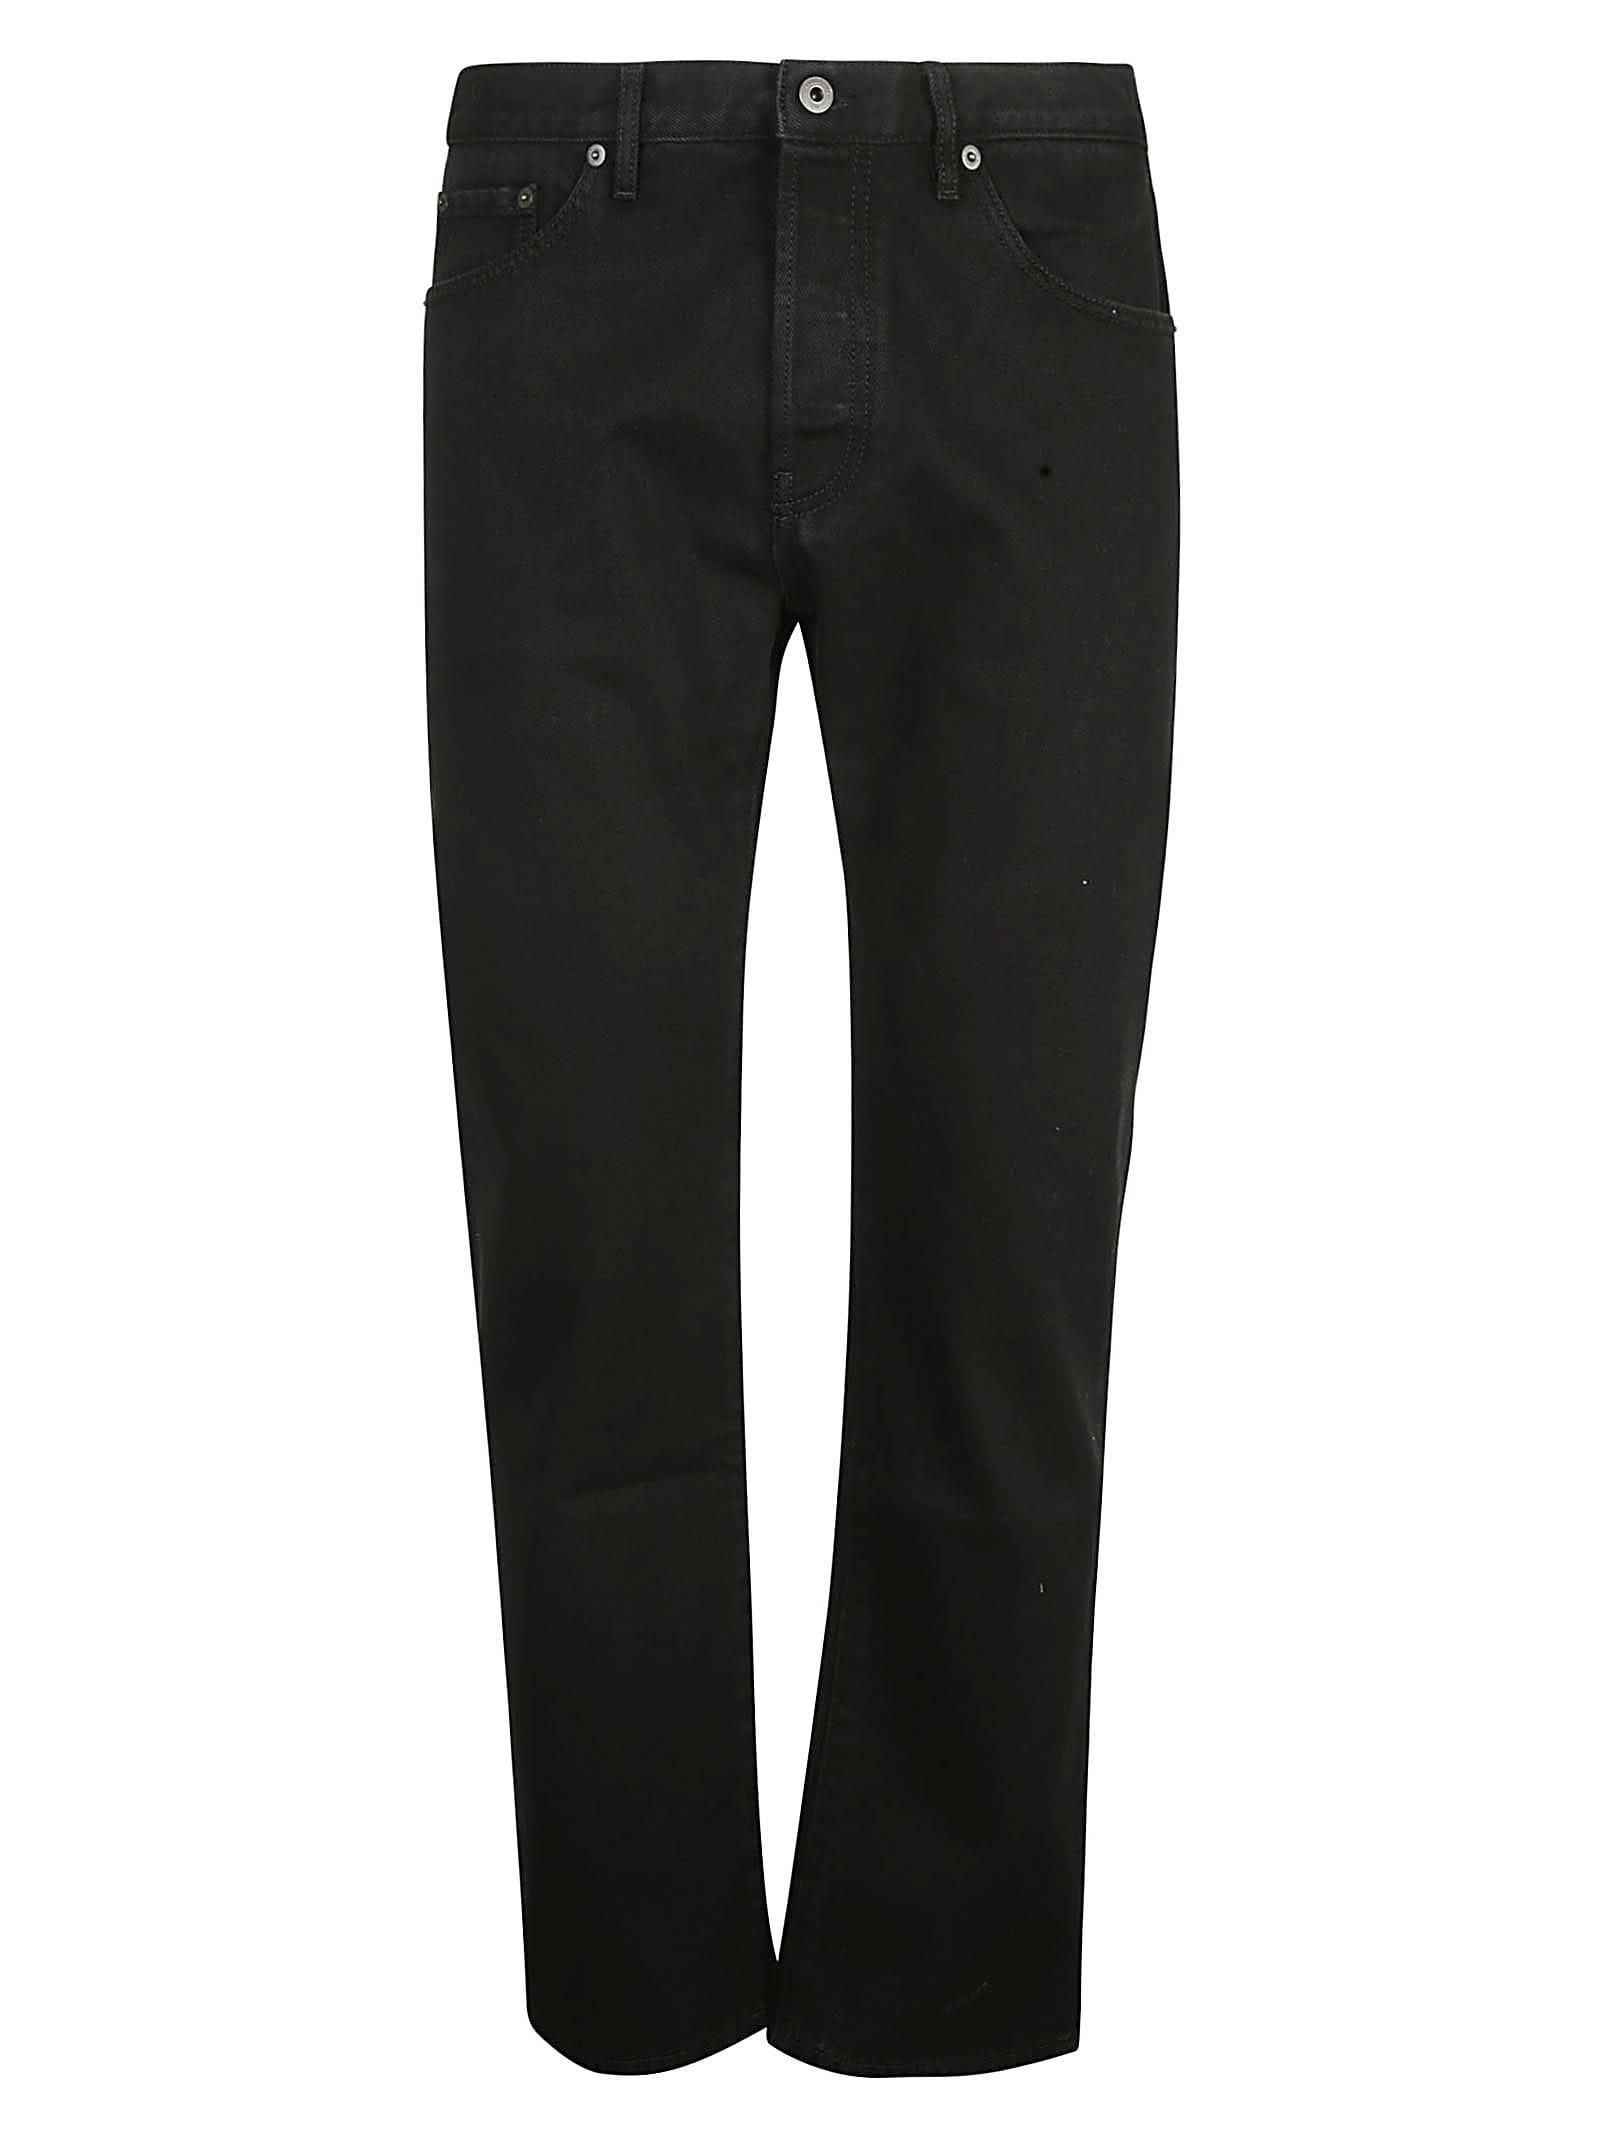 Valentino 5 Pocket Vltn Denim Jeans